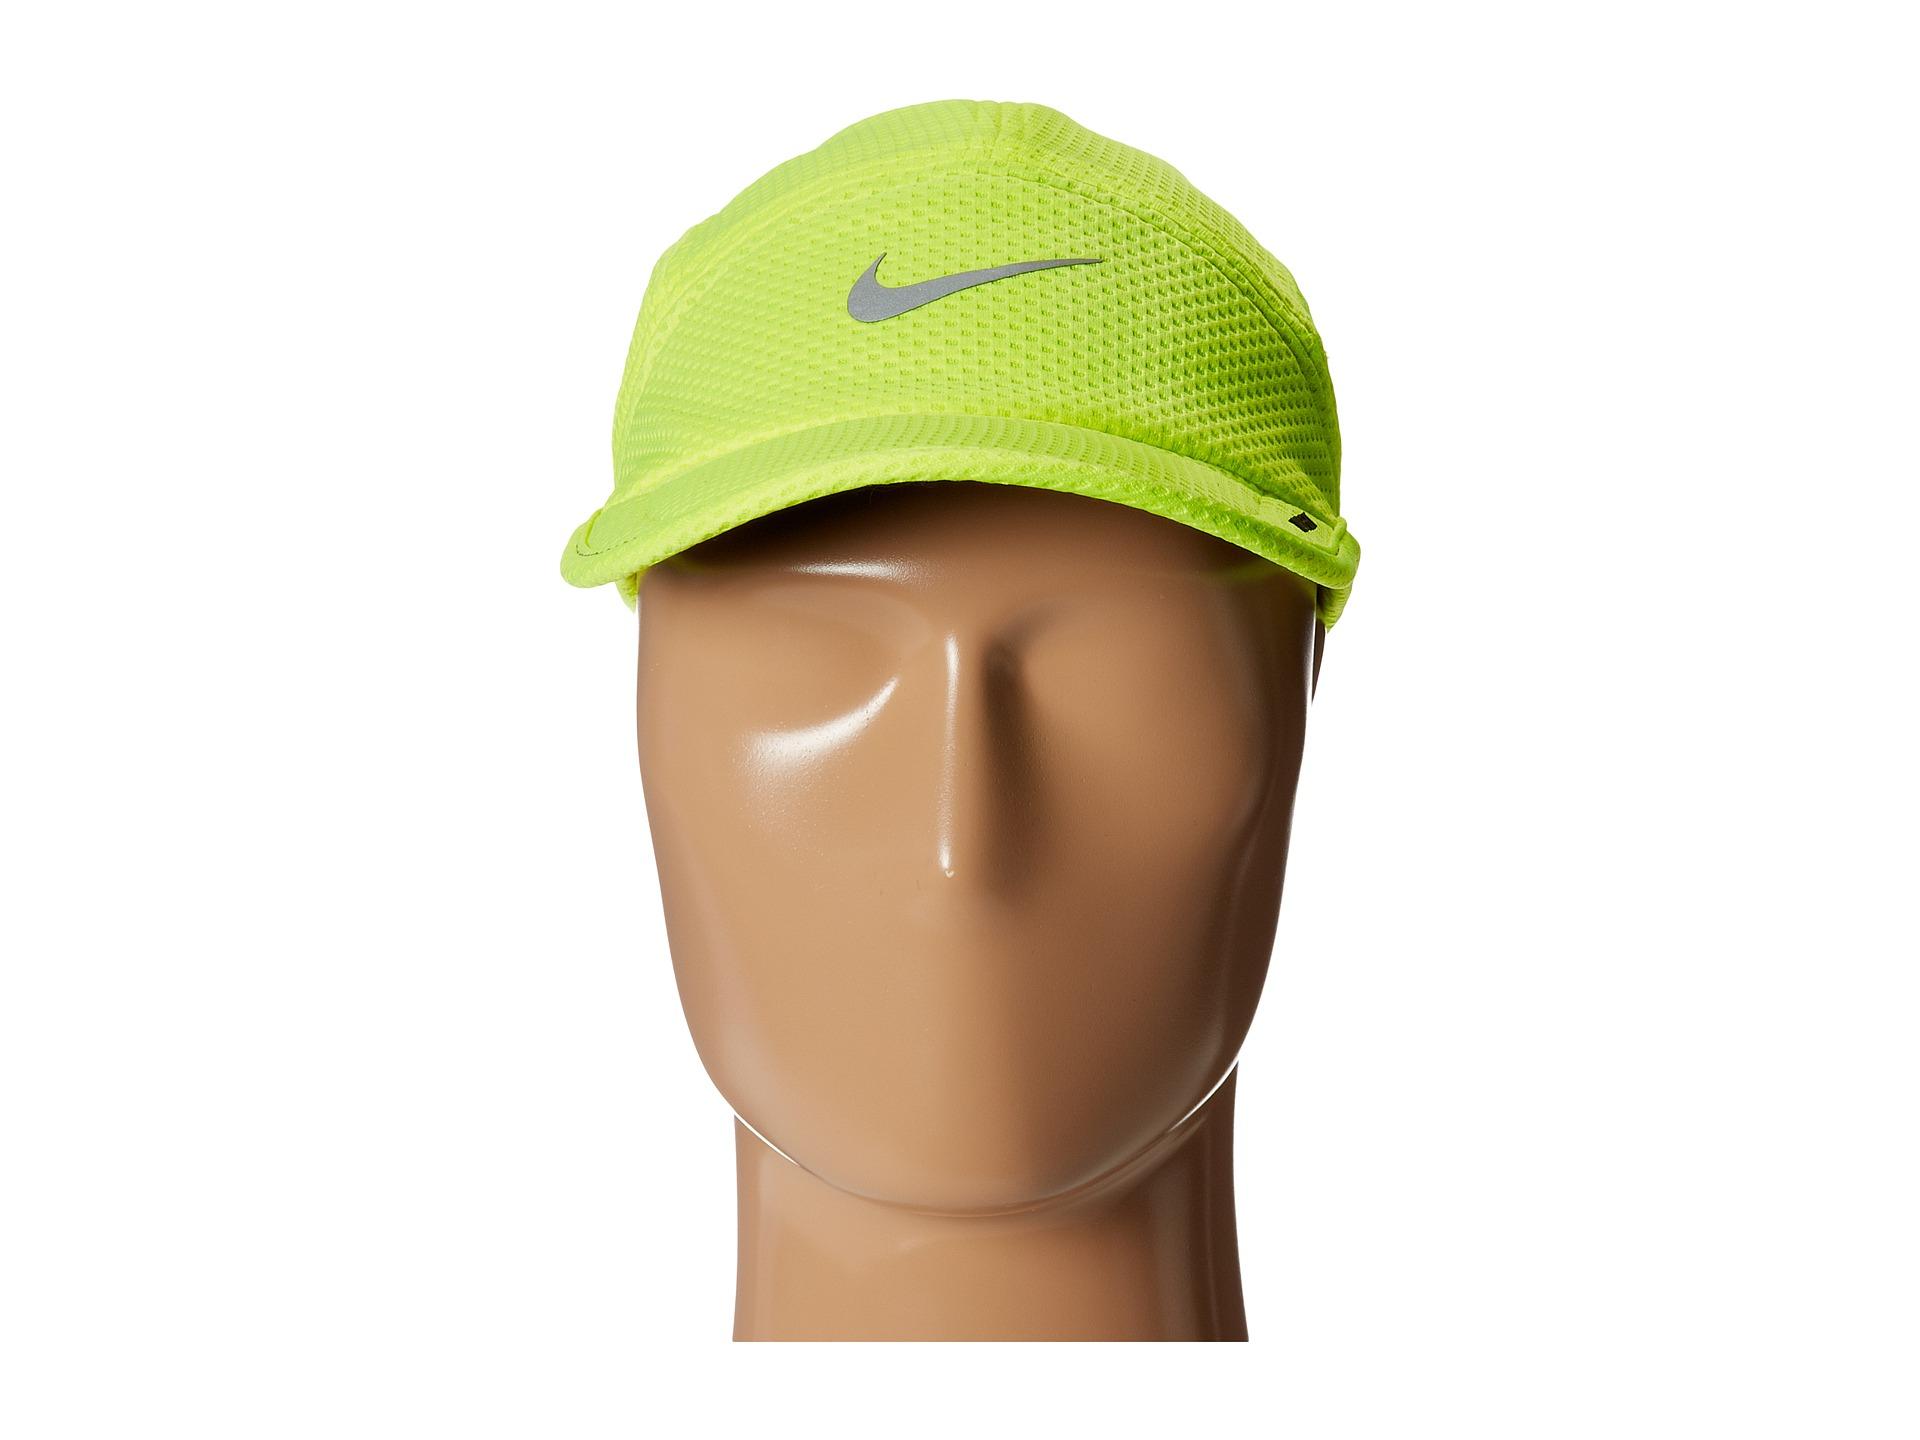 390f97ded6c Lyst - Nike Ru Tw Mesh Daybreak Cap in Yellow